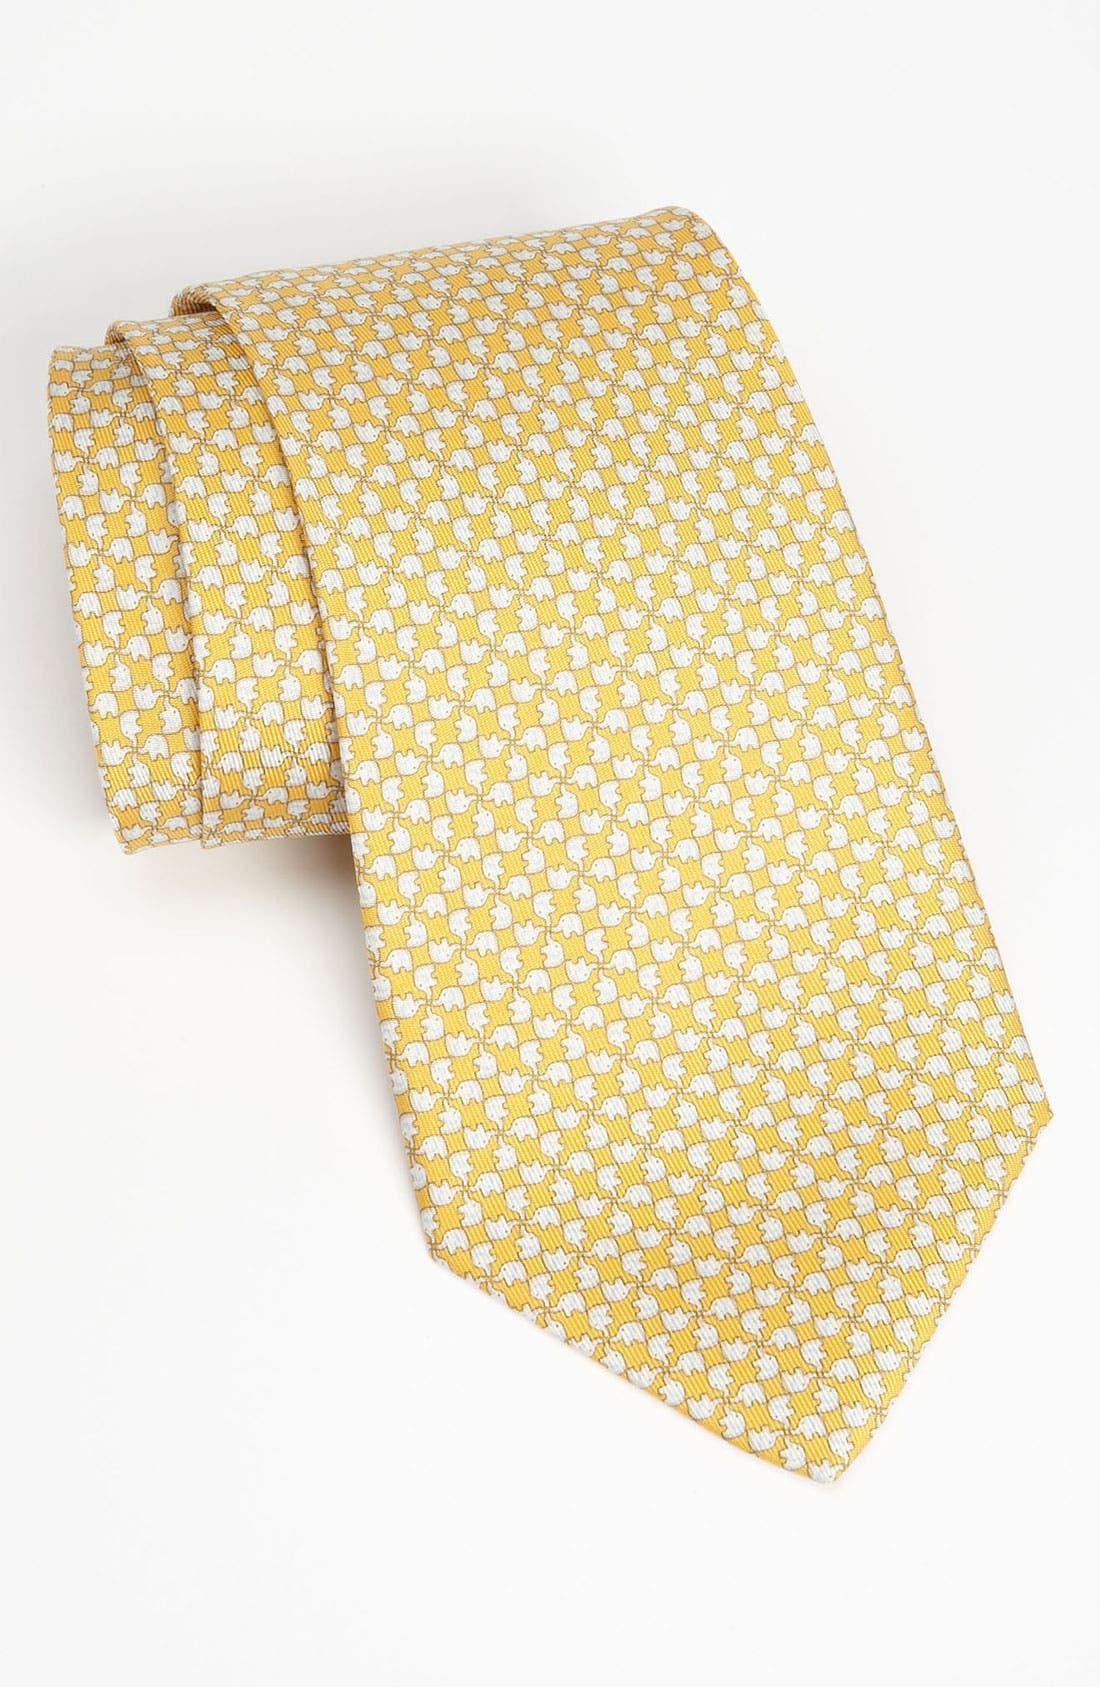 Alternate Image 1 Selected - Salvatore Ferragamo Woven Silk Tie